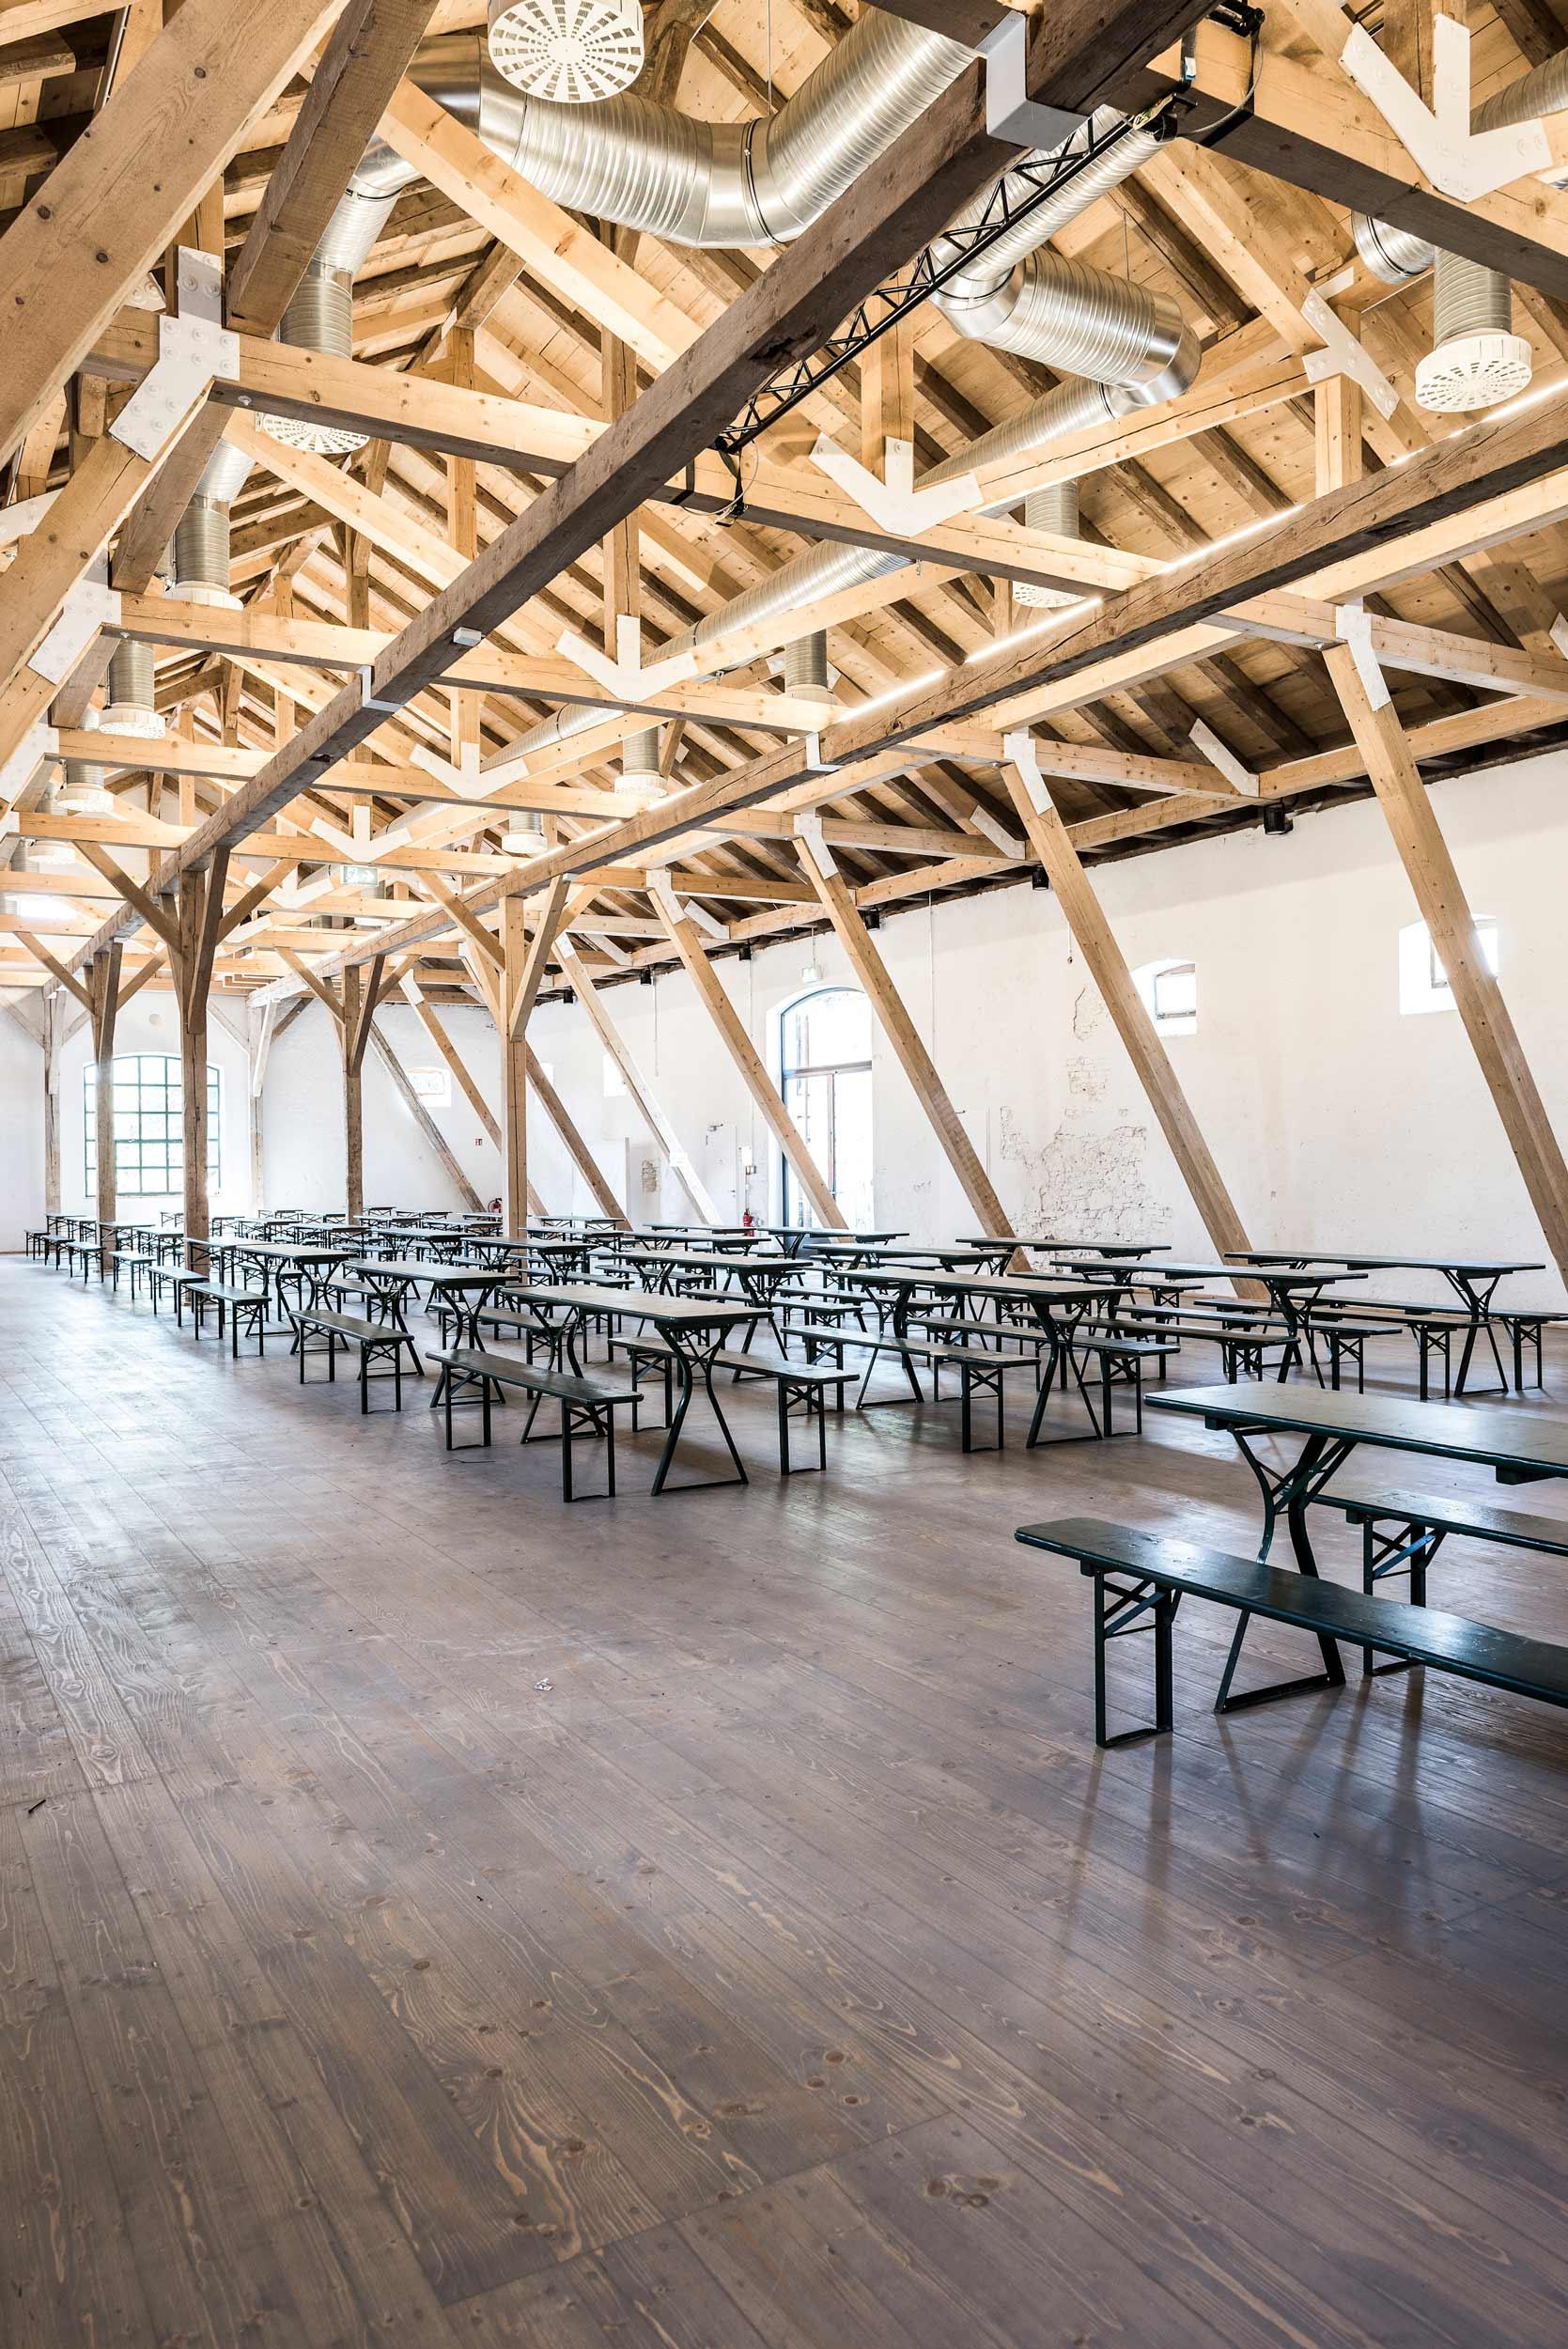 zimmerei-stoib-holzbau-holzhaus-gut-kaltenbrunn-tegernsee-festsaal-restaurant-sanierung-binderkonstruktion-käfer-rinderstall-05.jpg